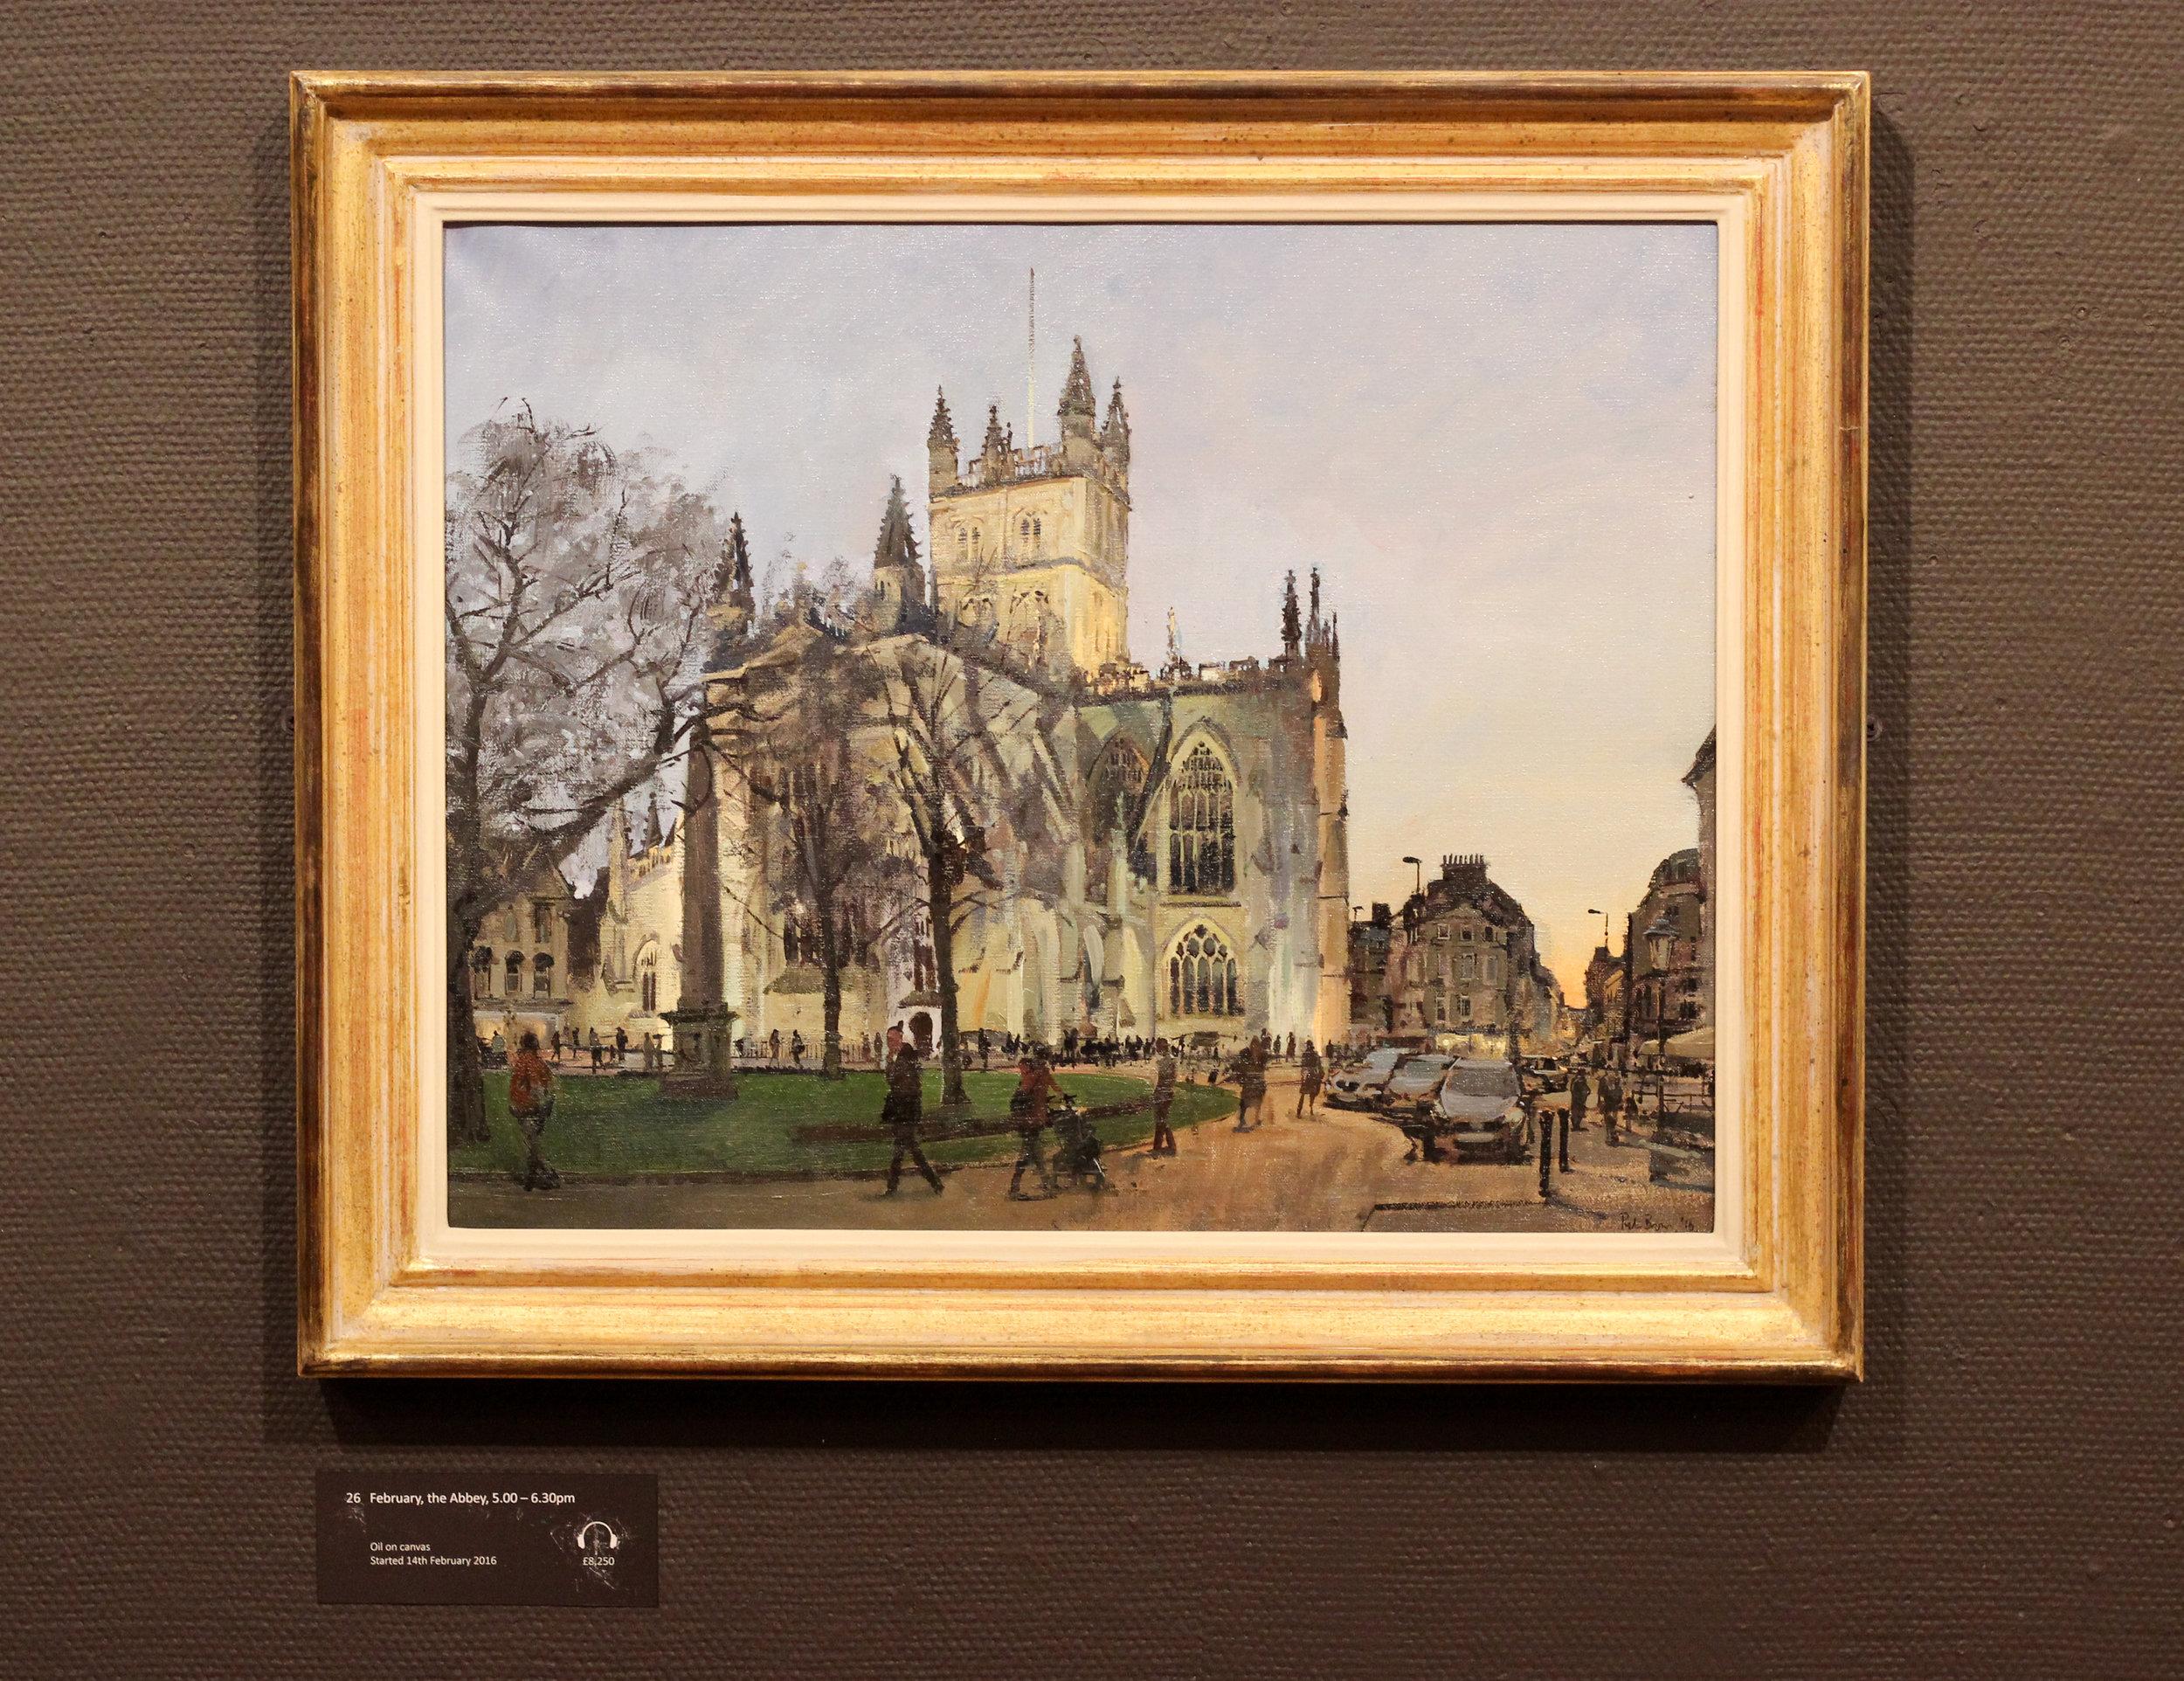 Peter Brown Artist Exhibition Victoria Art Gallery Review